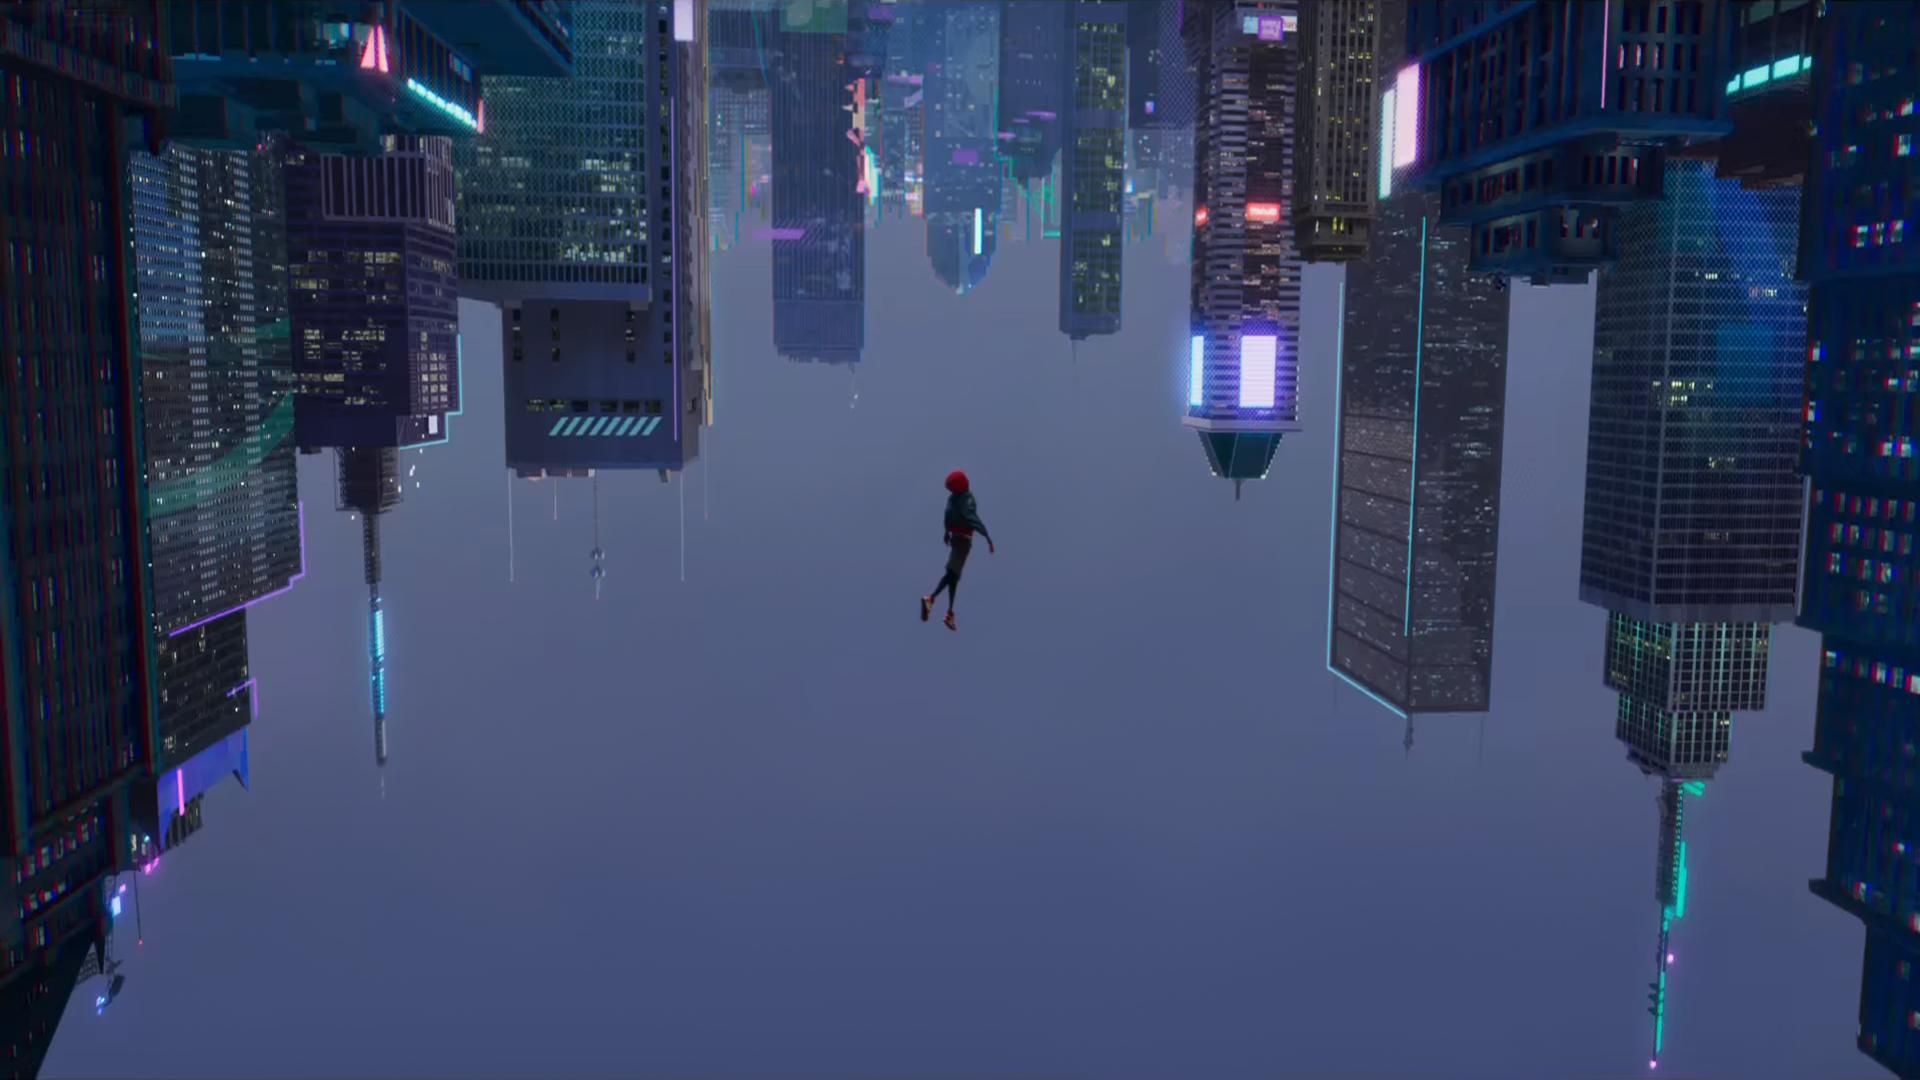 General 1920x1080 Spider-Man skyscraper neon lights Miles Morales